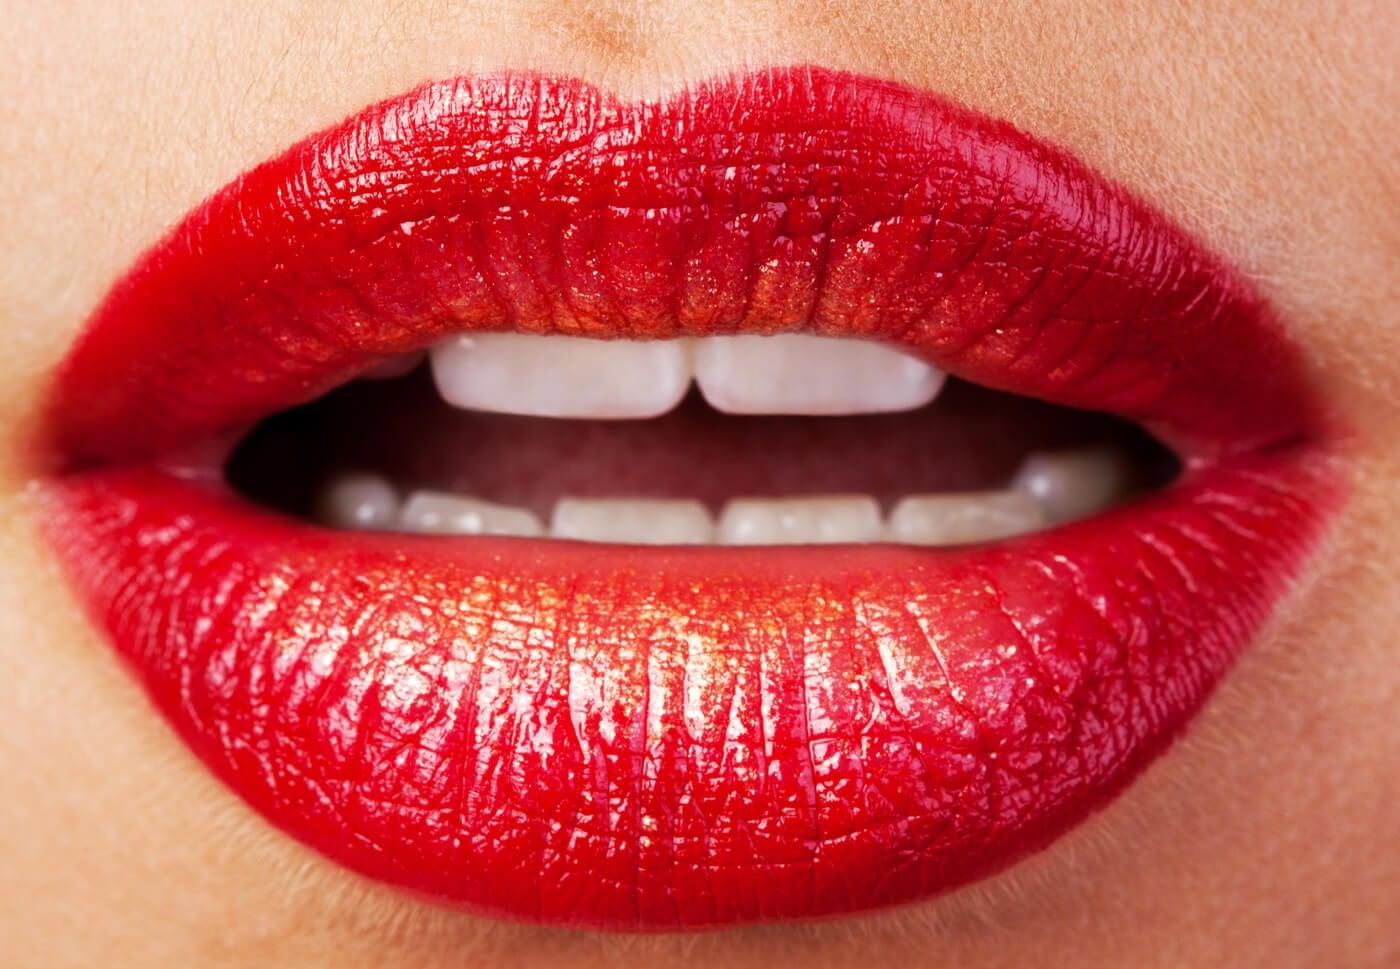 Powder kiss, la tendencia de labios que arrasa